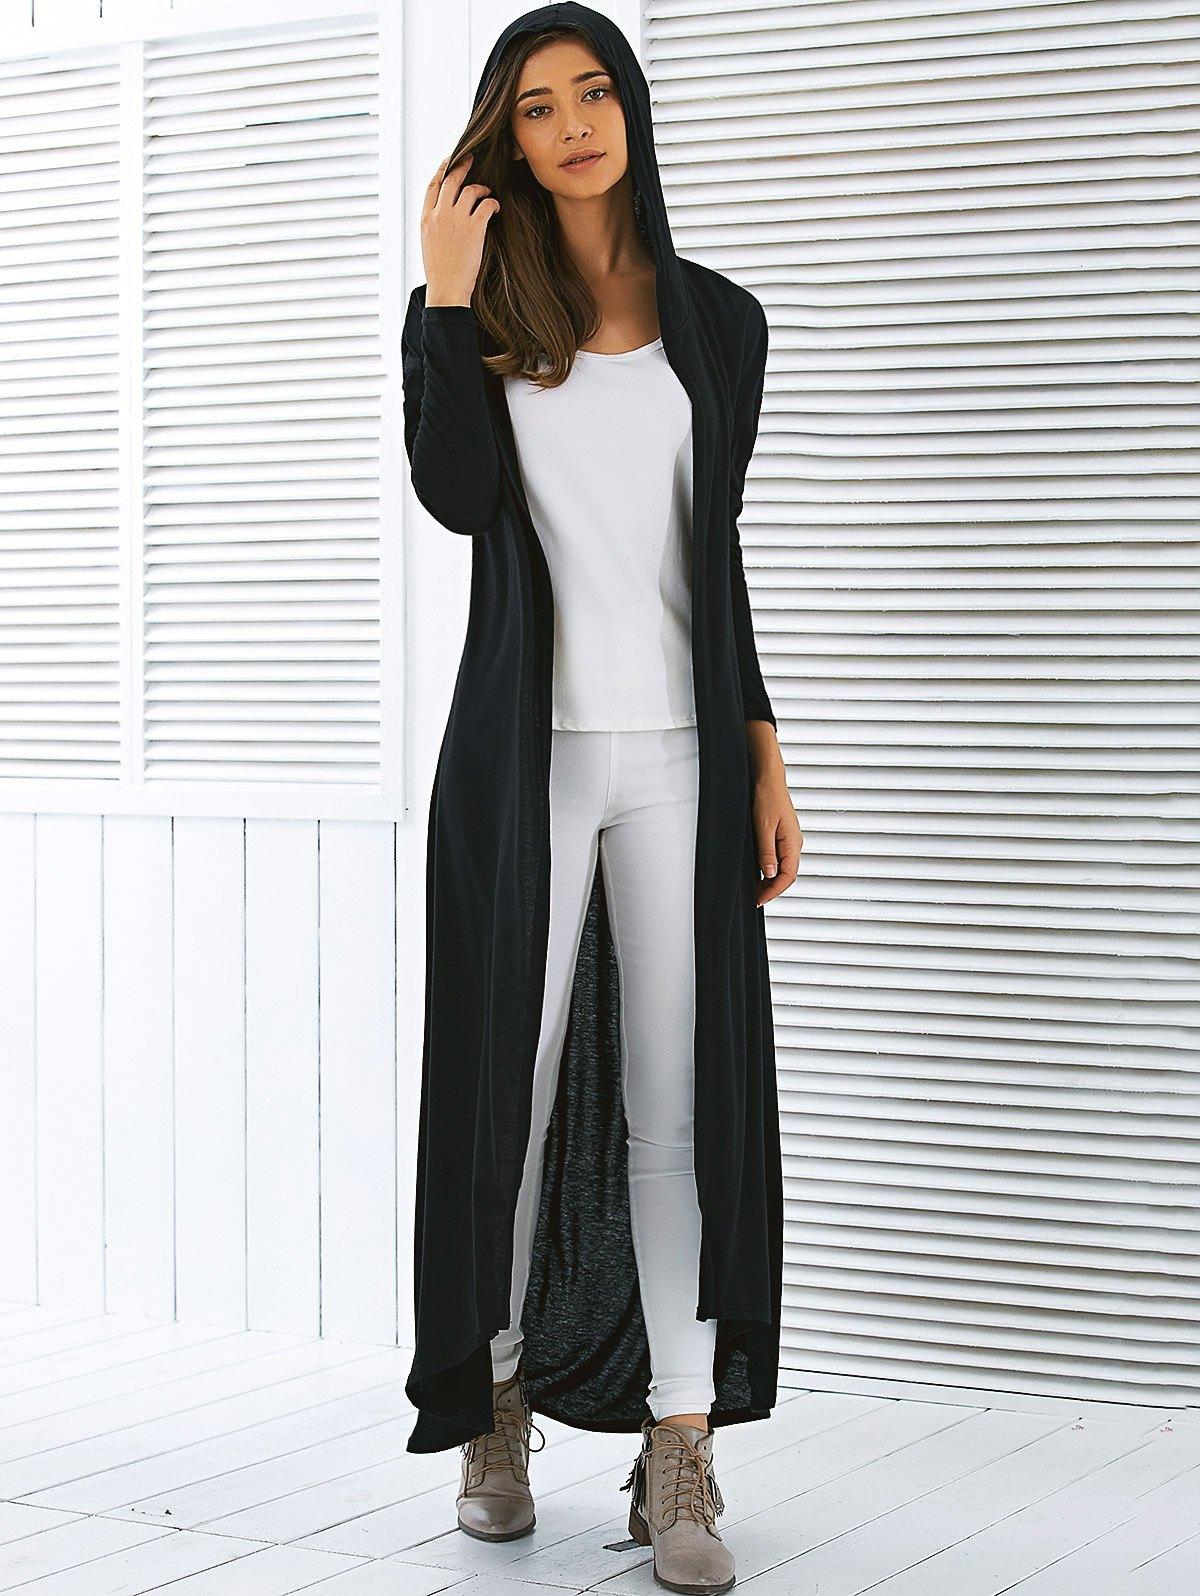 Long Cardigan Hooded Duster Floor Length Olive Or Black ...